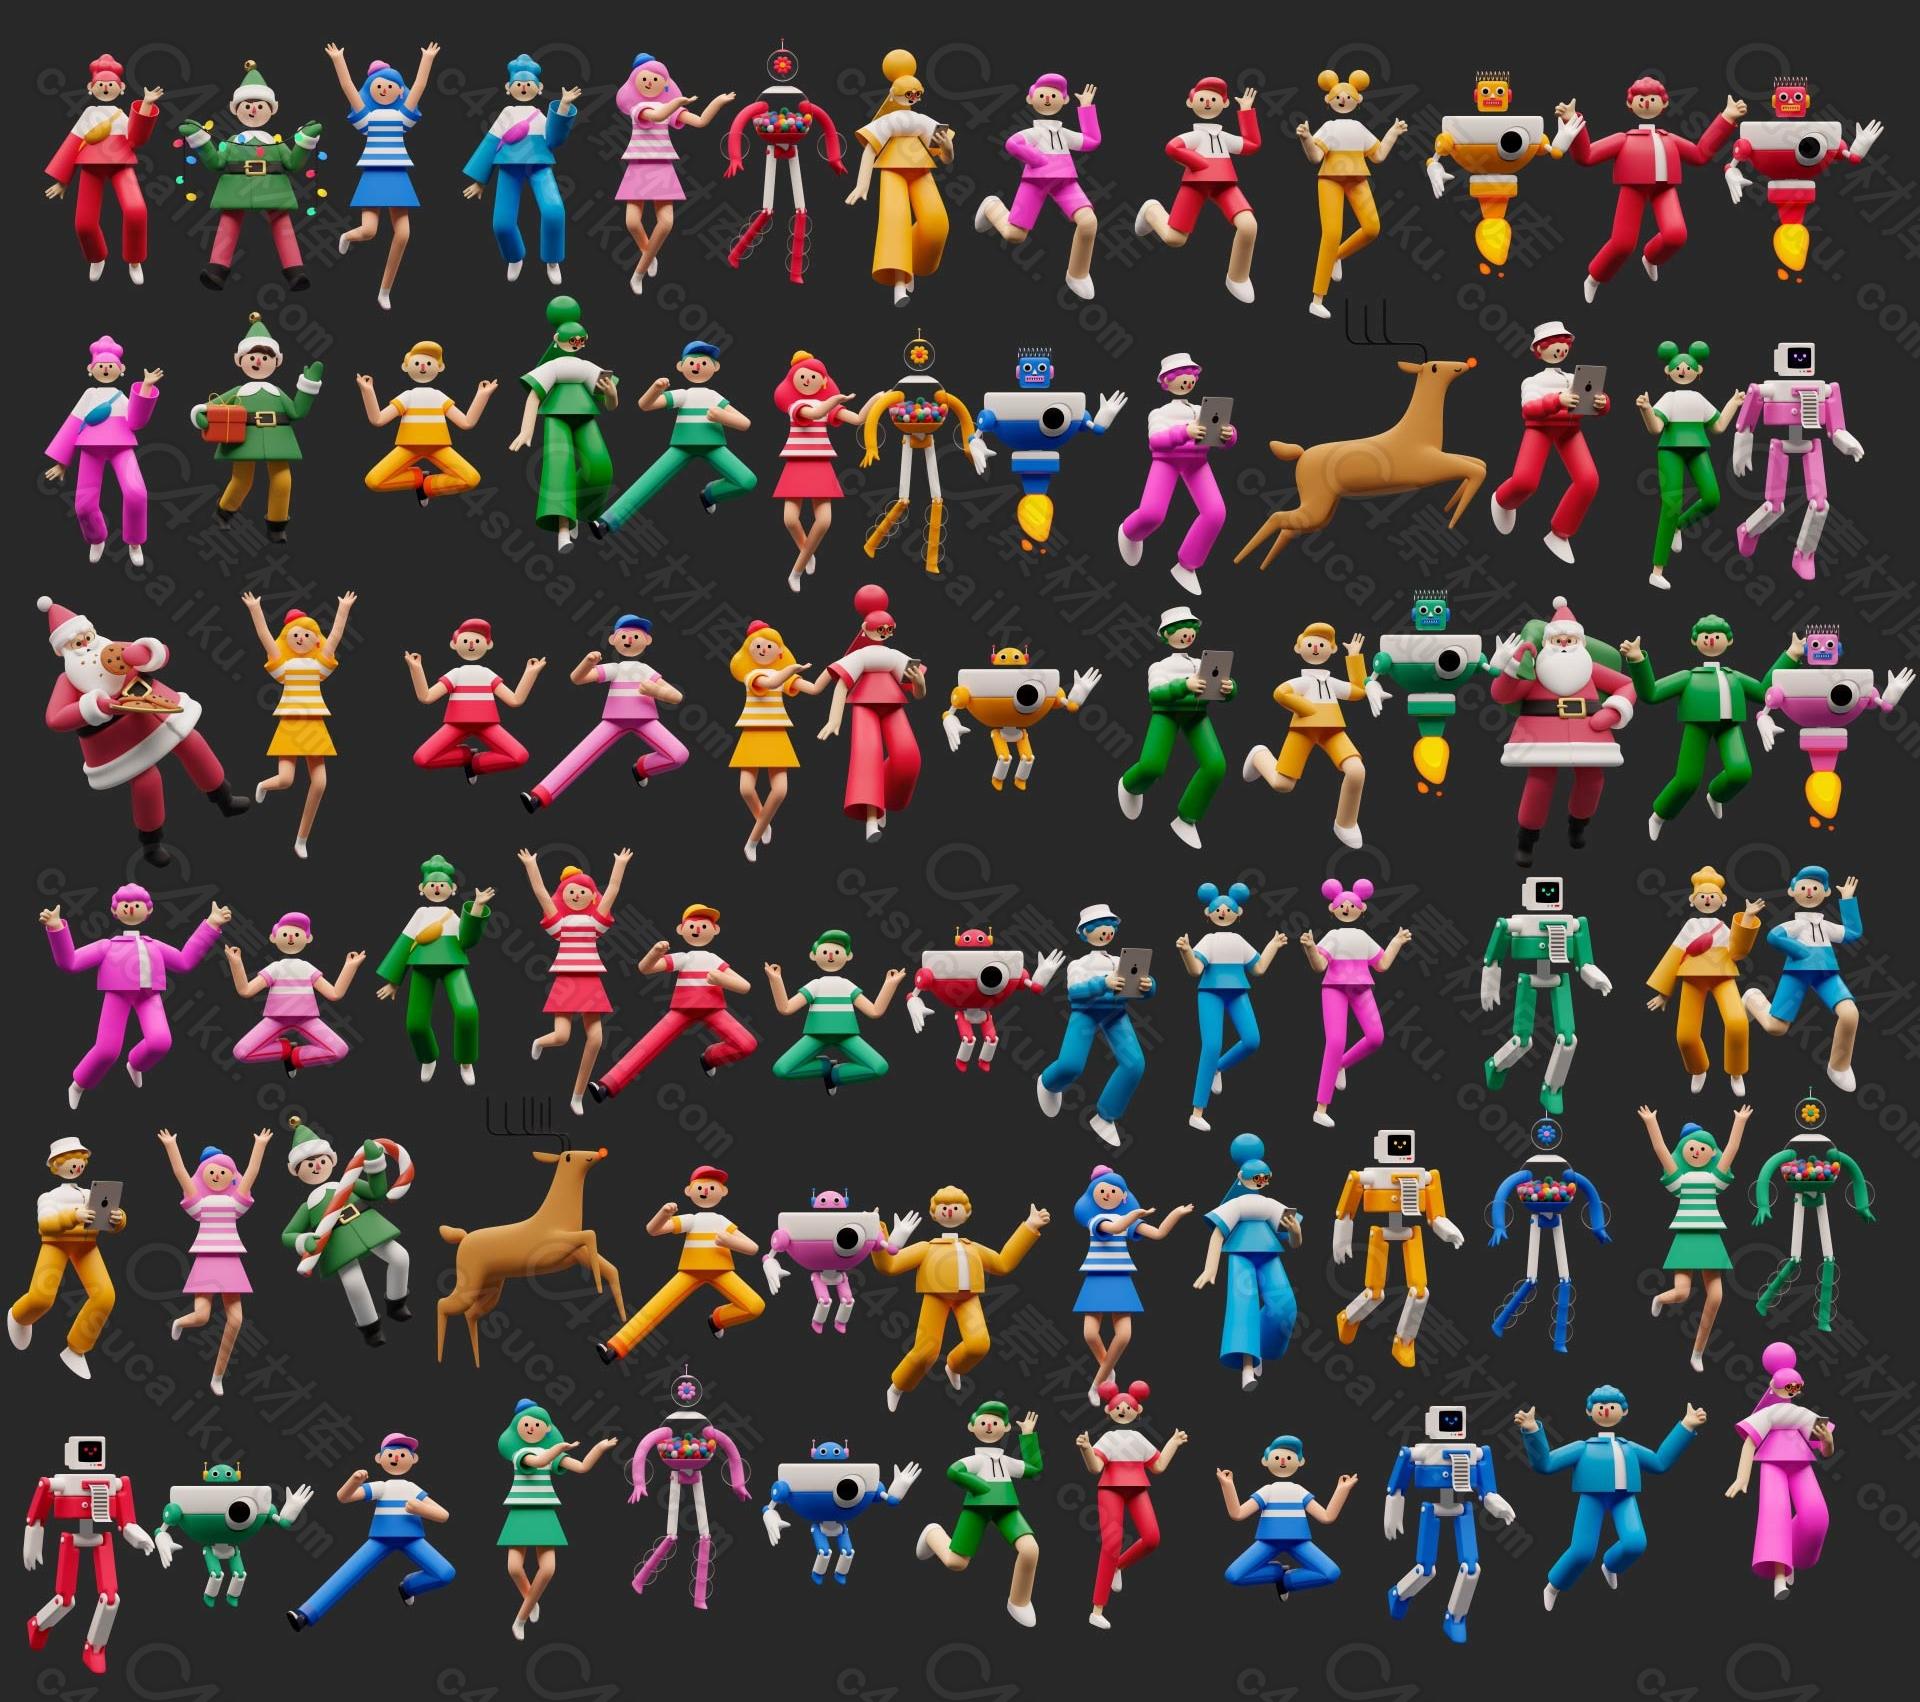 C4素材网-Blender工程-3D卡通人物角色场景合集【带绑定】